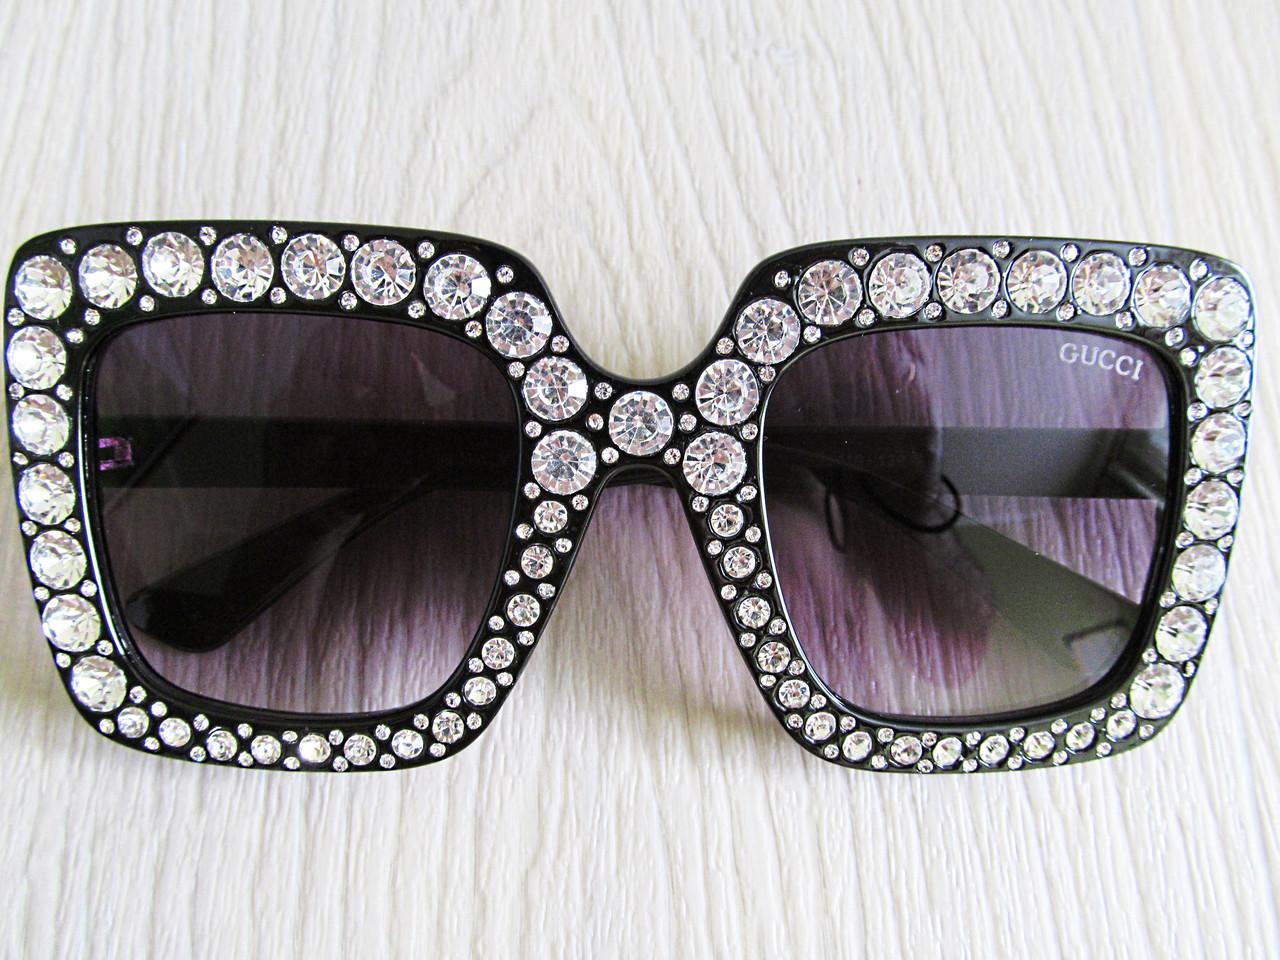 fc54b1fb1fd7 Новинка! солнцезащитные очки с камнями реплика Гуччи  заказ, цены в ...